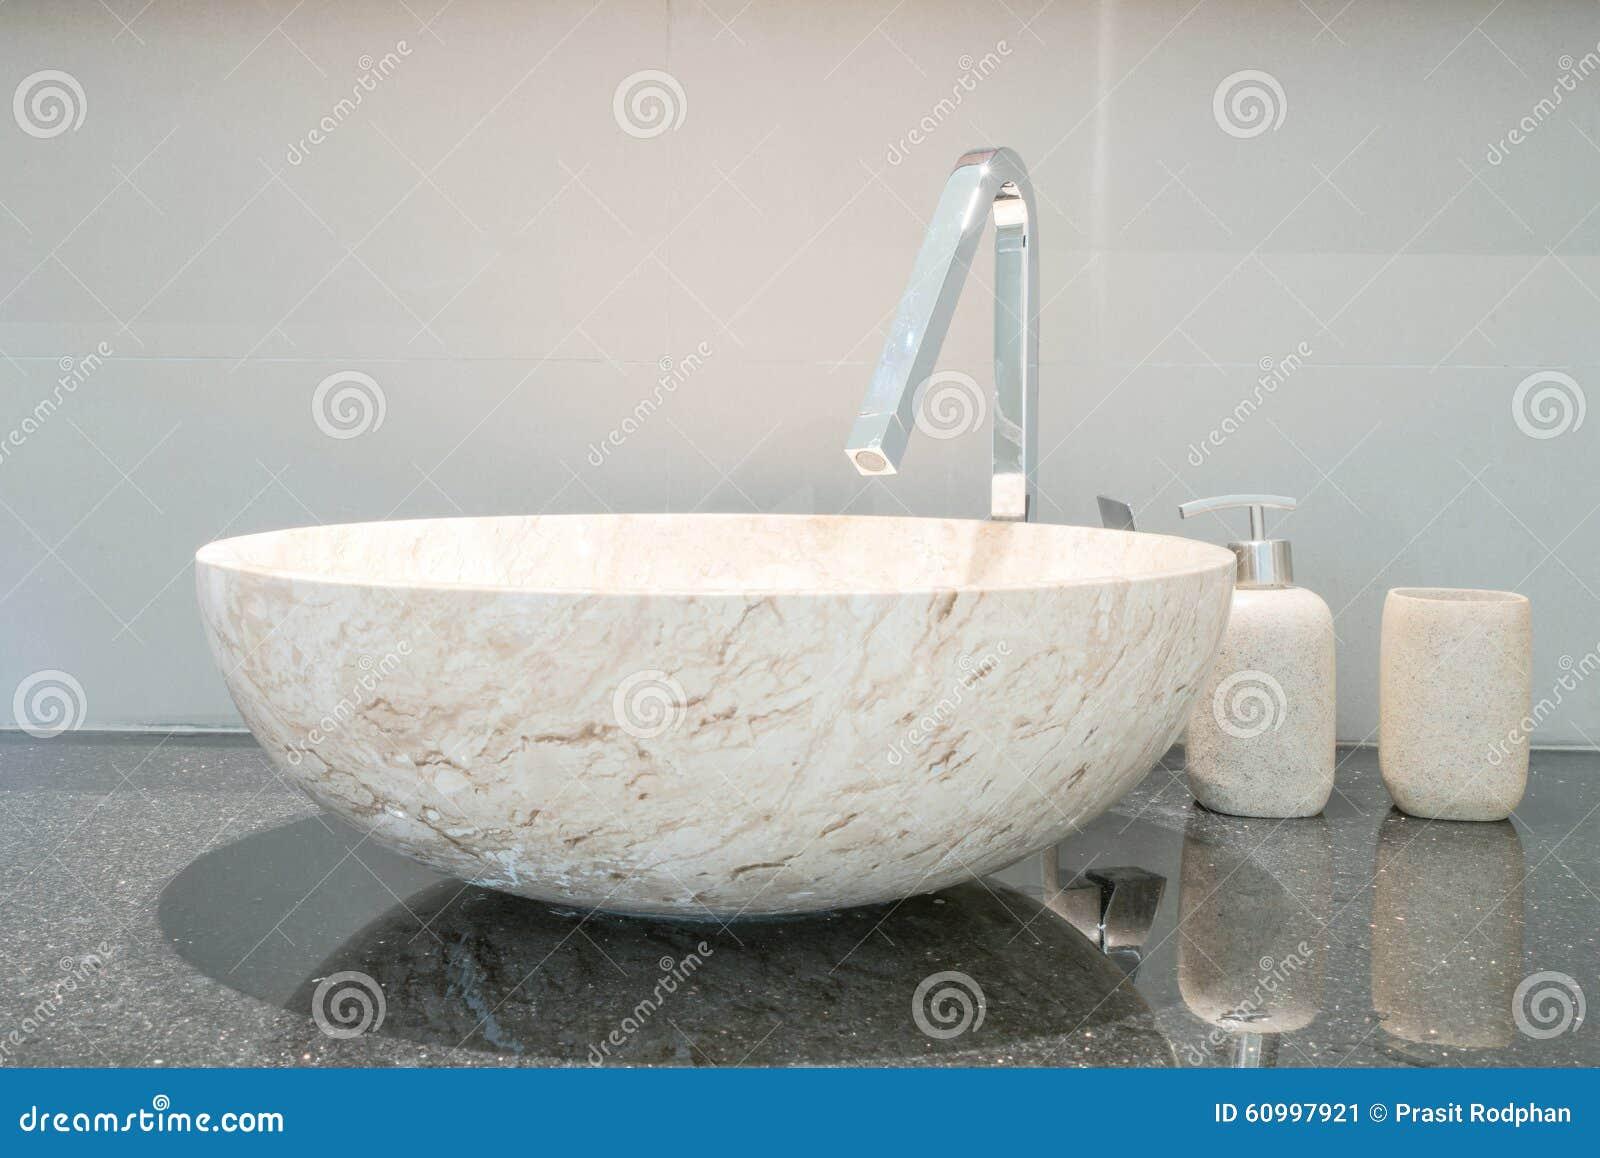 lavabo salle de bain moderne interesting vasque de salle bain on decoration d interieur moderne. Black Bedroom Furniture Sets. Home Design Ideas